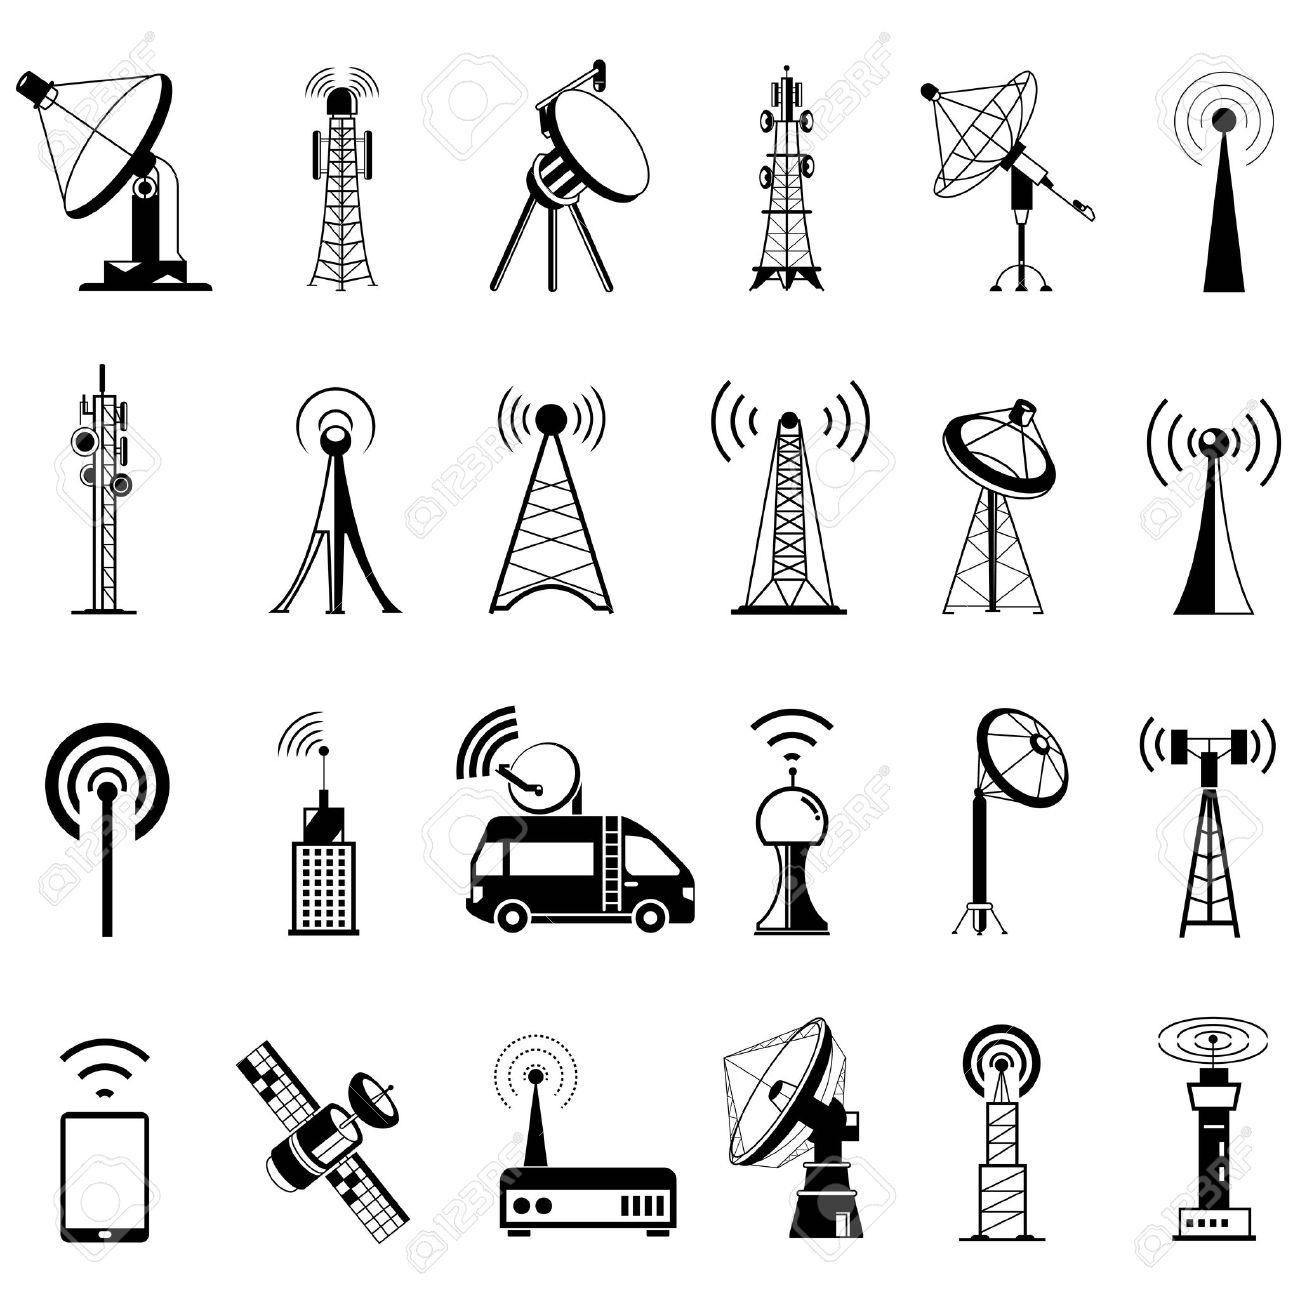 communication tower icons, satellite dishes, antenna - 43295018